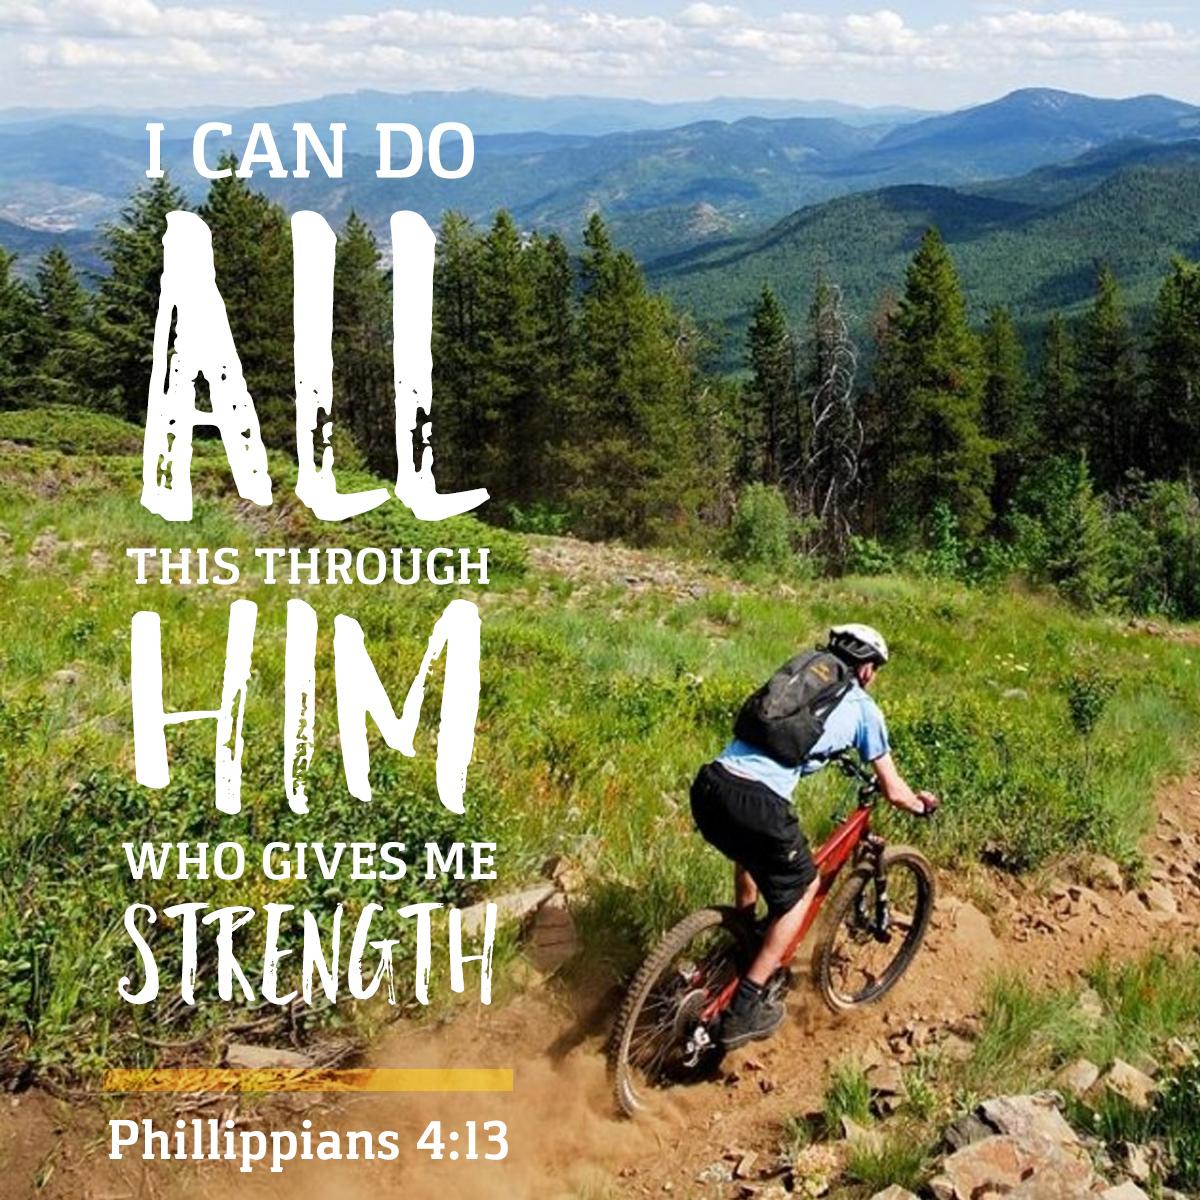 Daily Verse - Phillippians 4:13